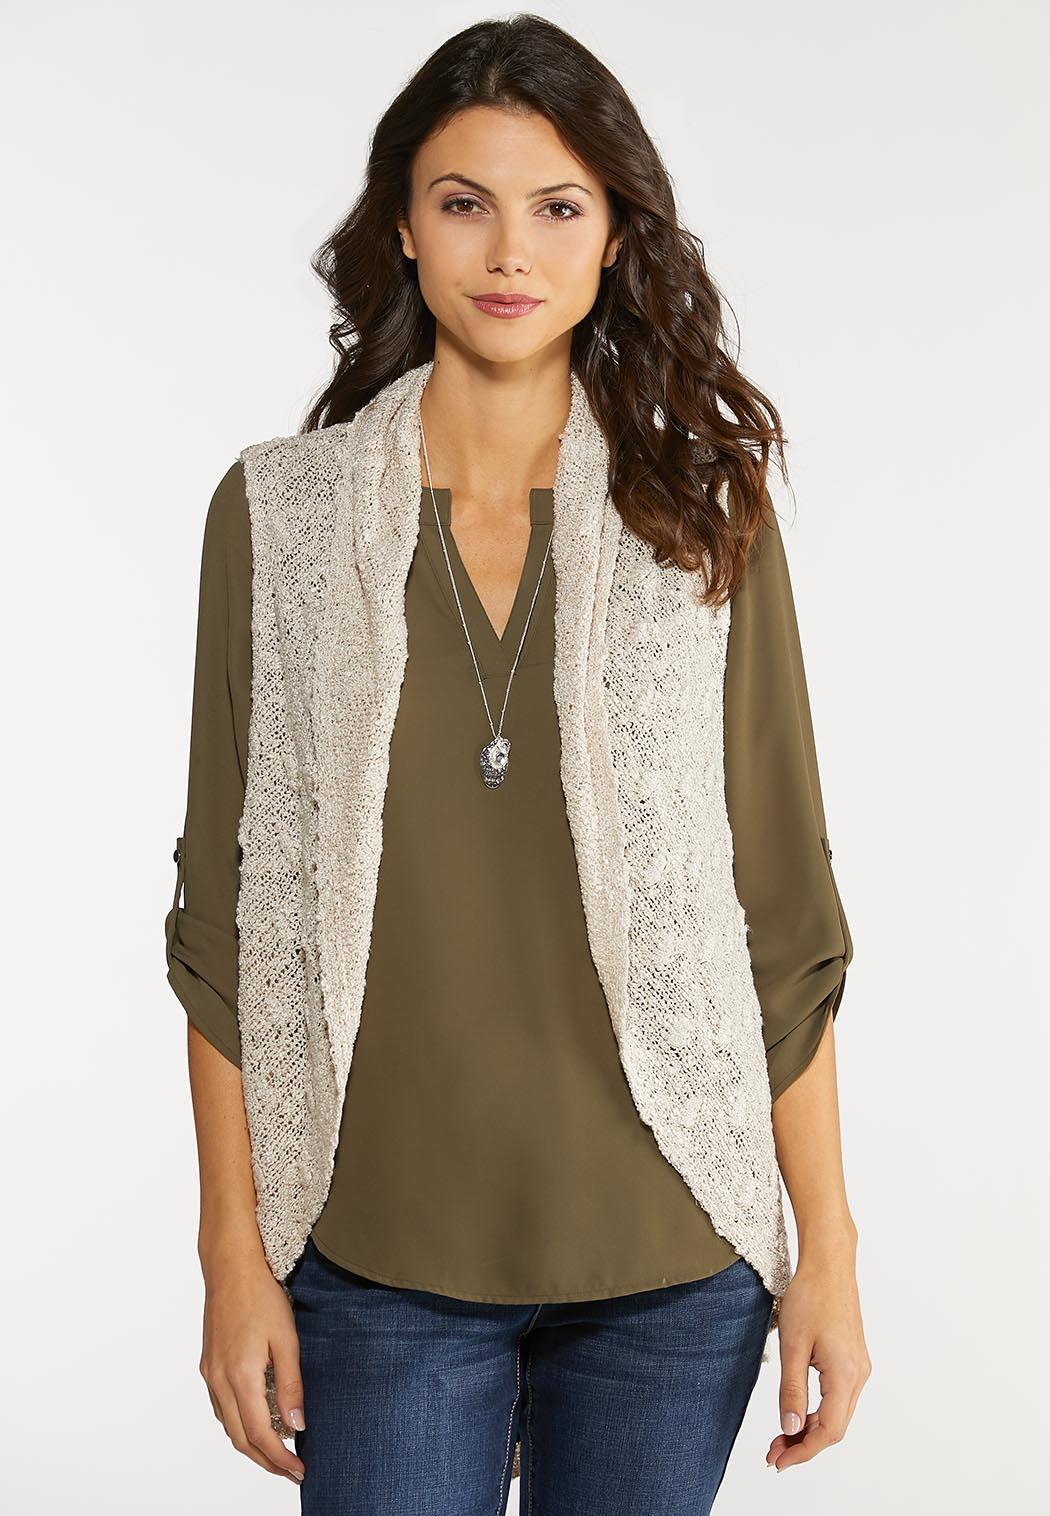 Plus Size Beige Sweater Vest